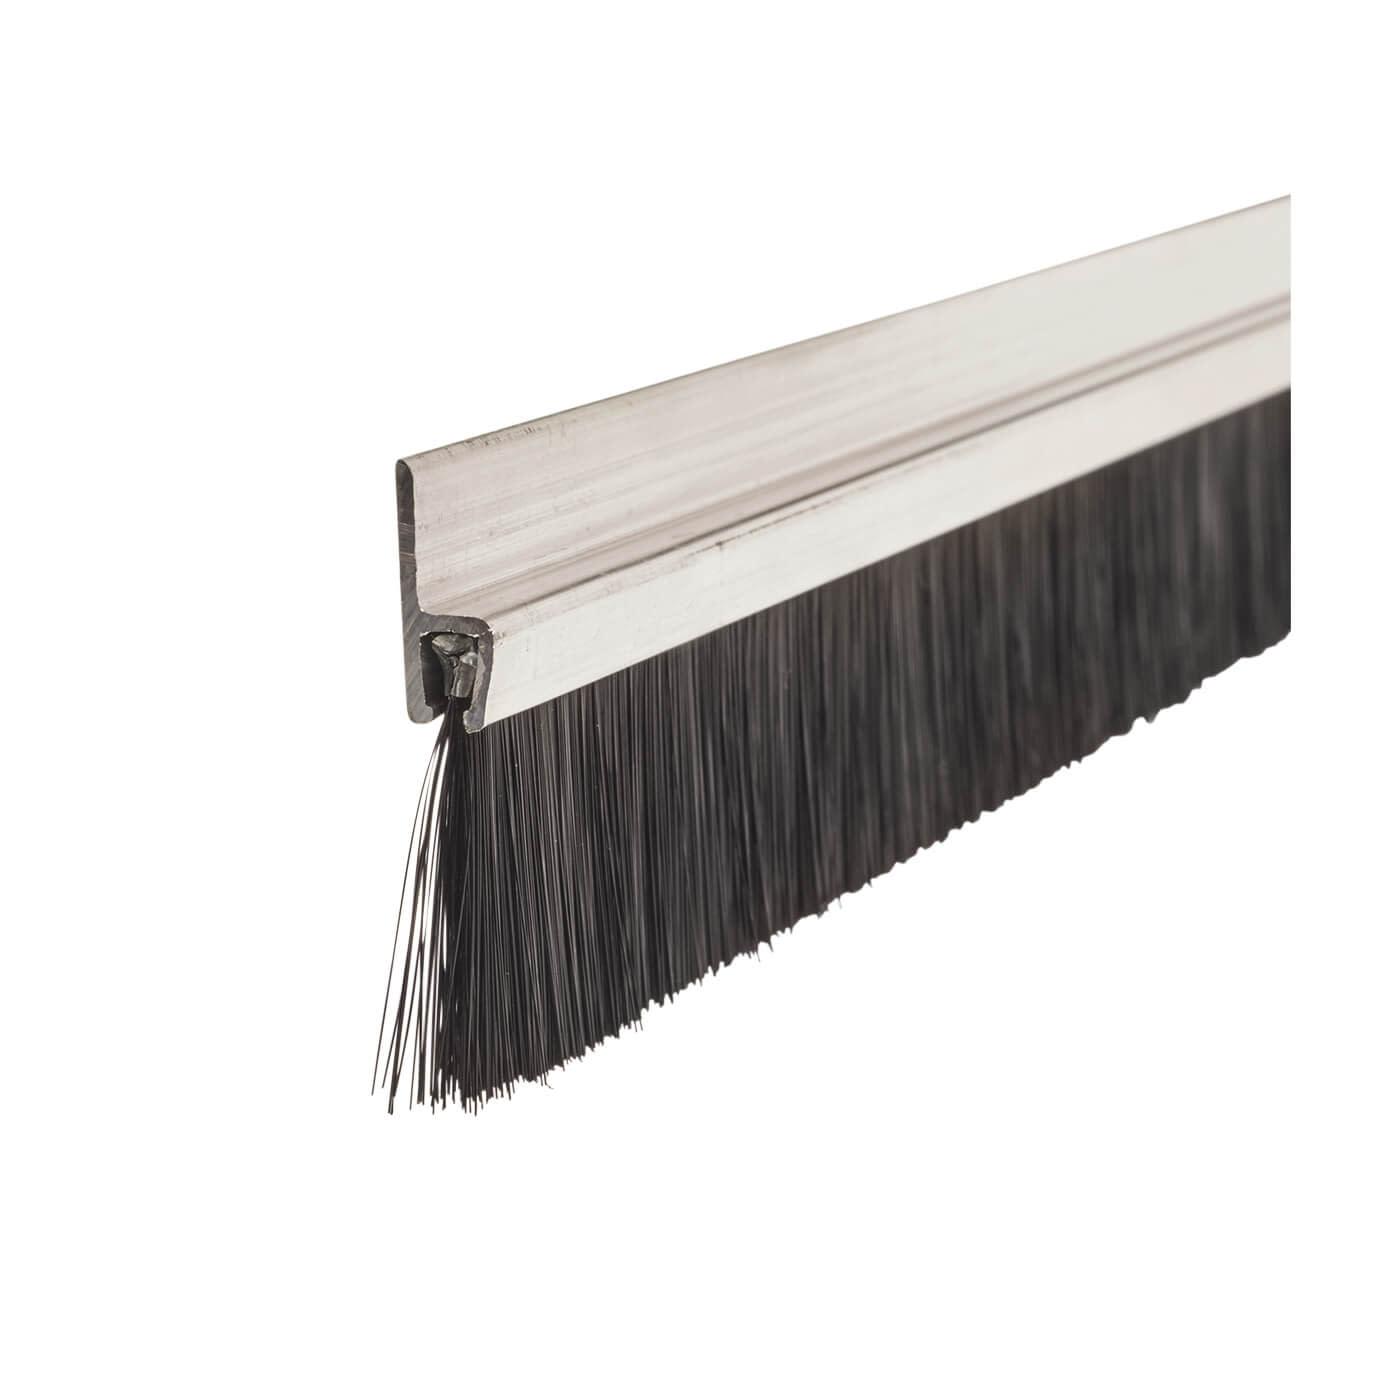 Brush Strip H3 - Brush Size 24mm - 3000mm)